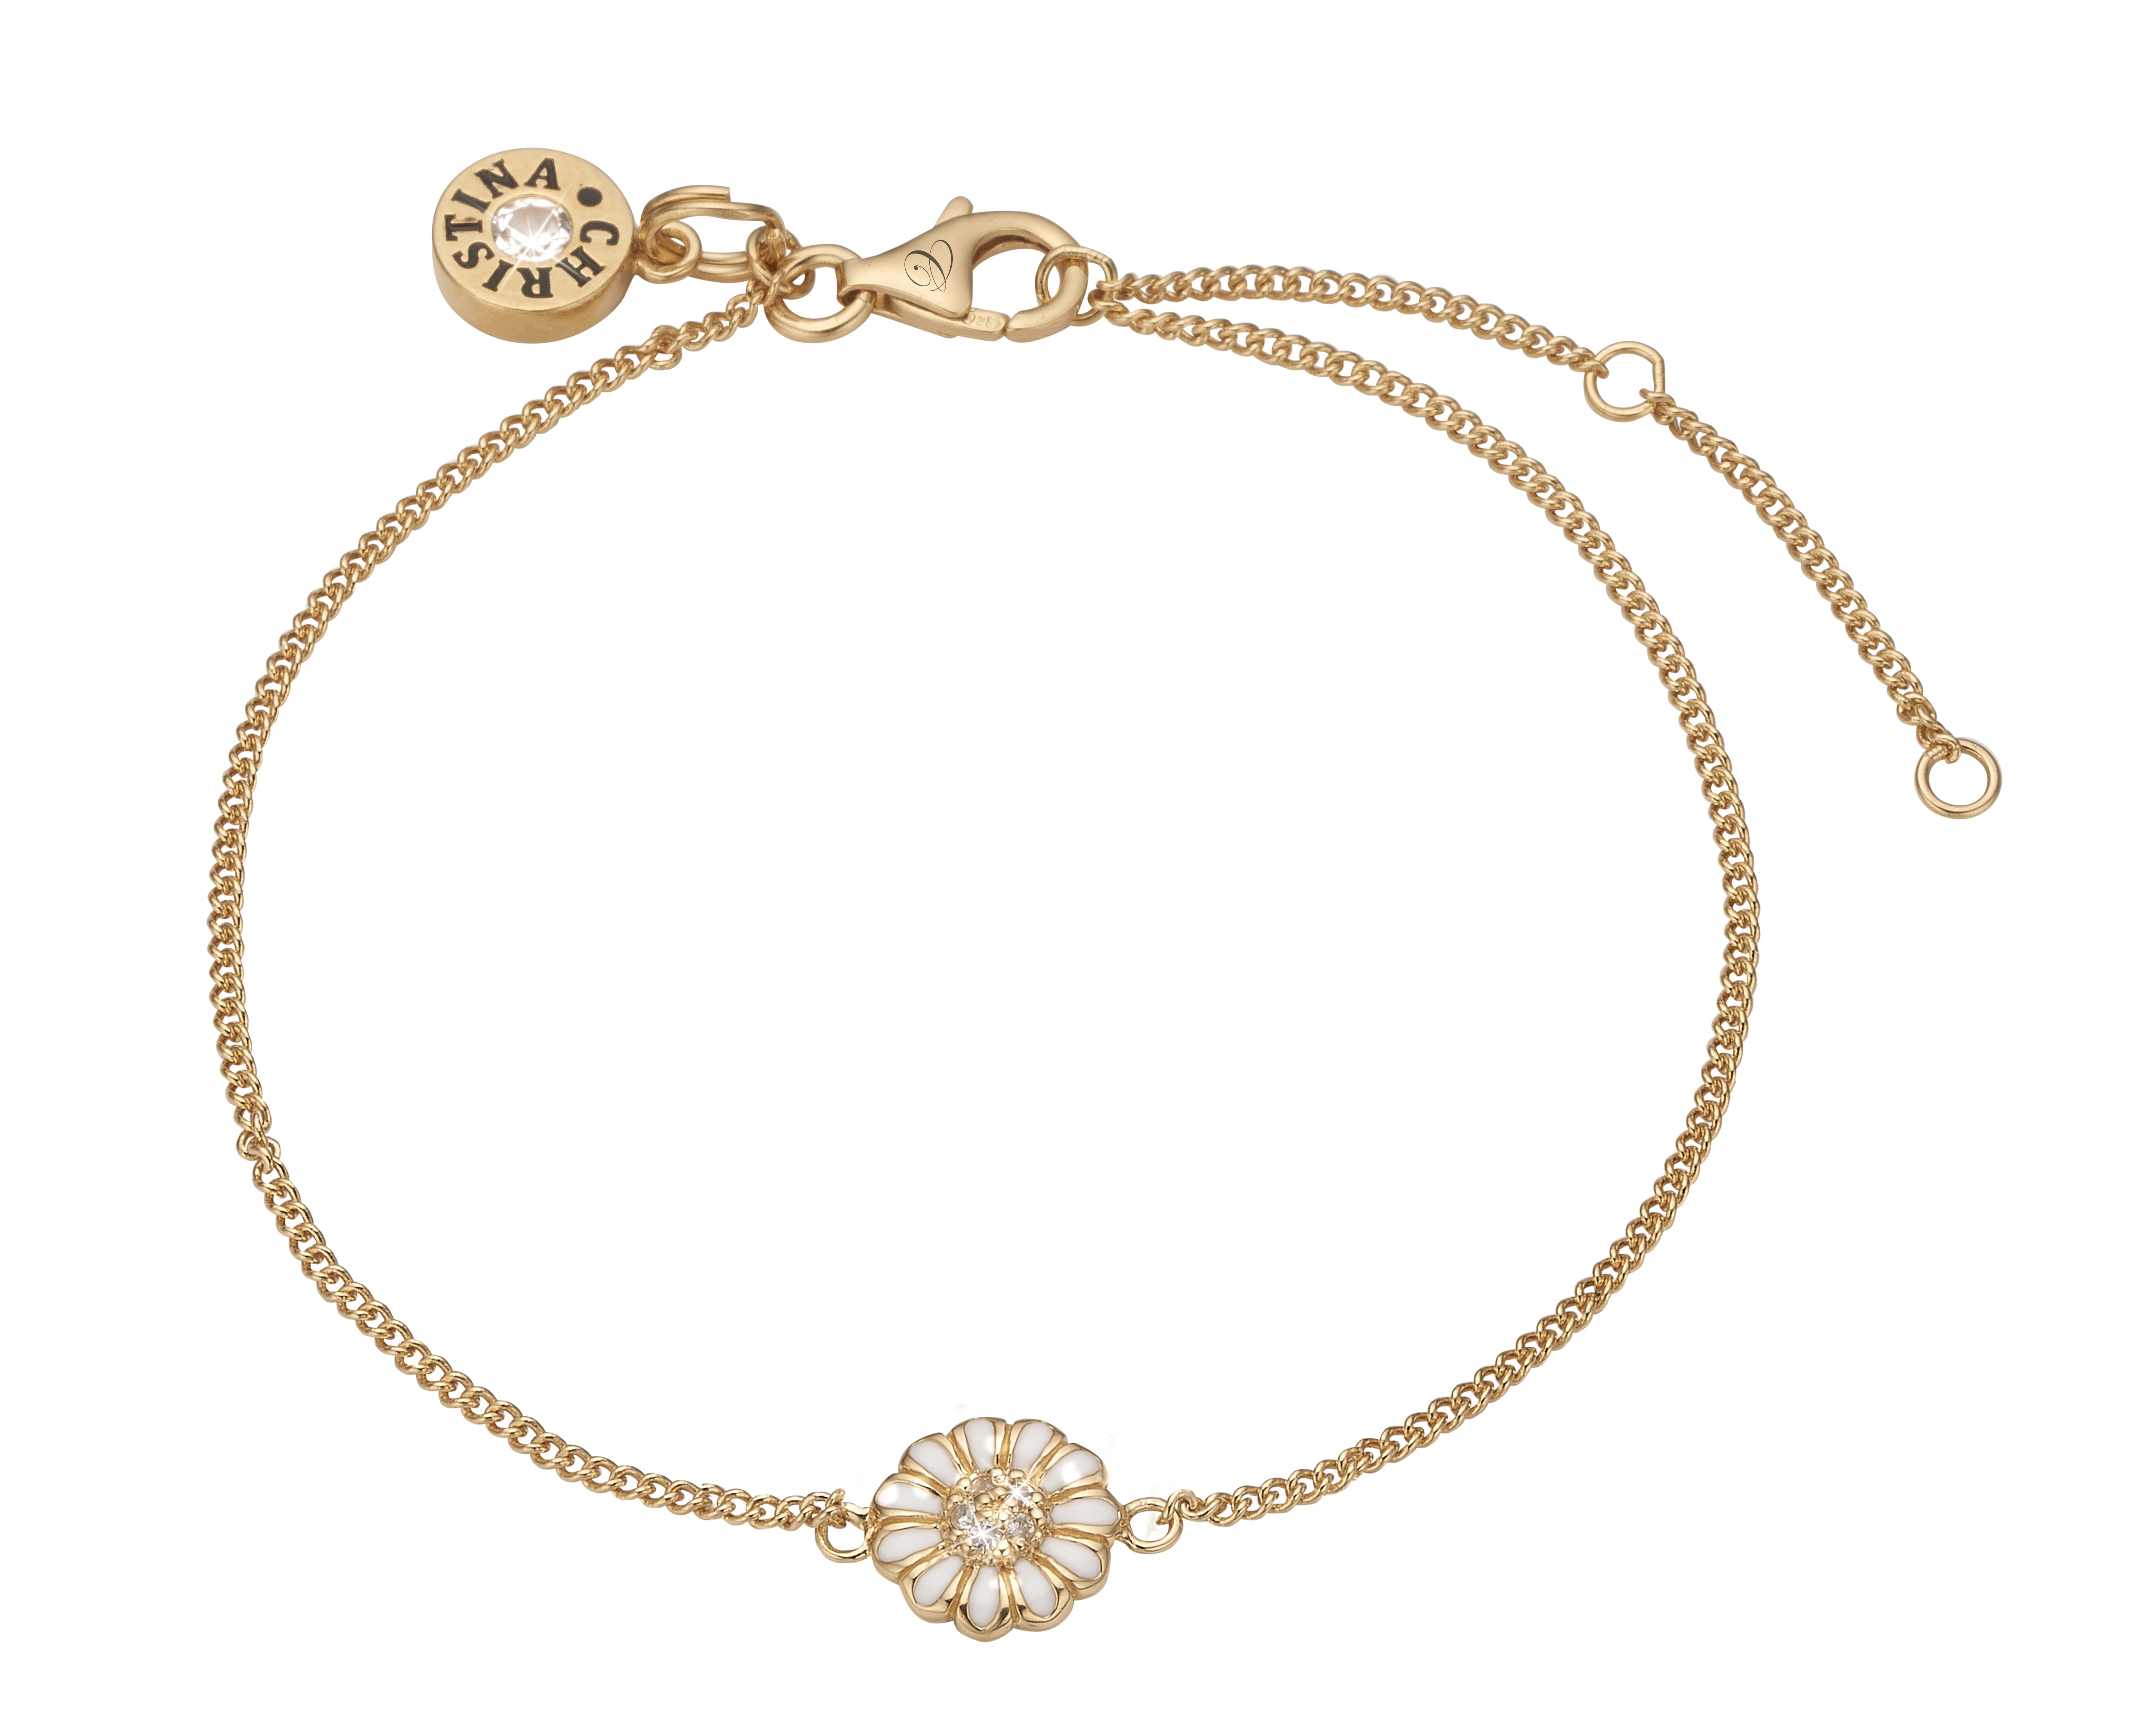 Christina marguerit armbånd - 601-G01 20 centimeter